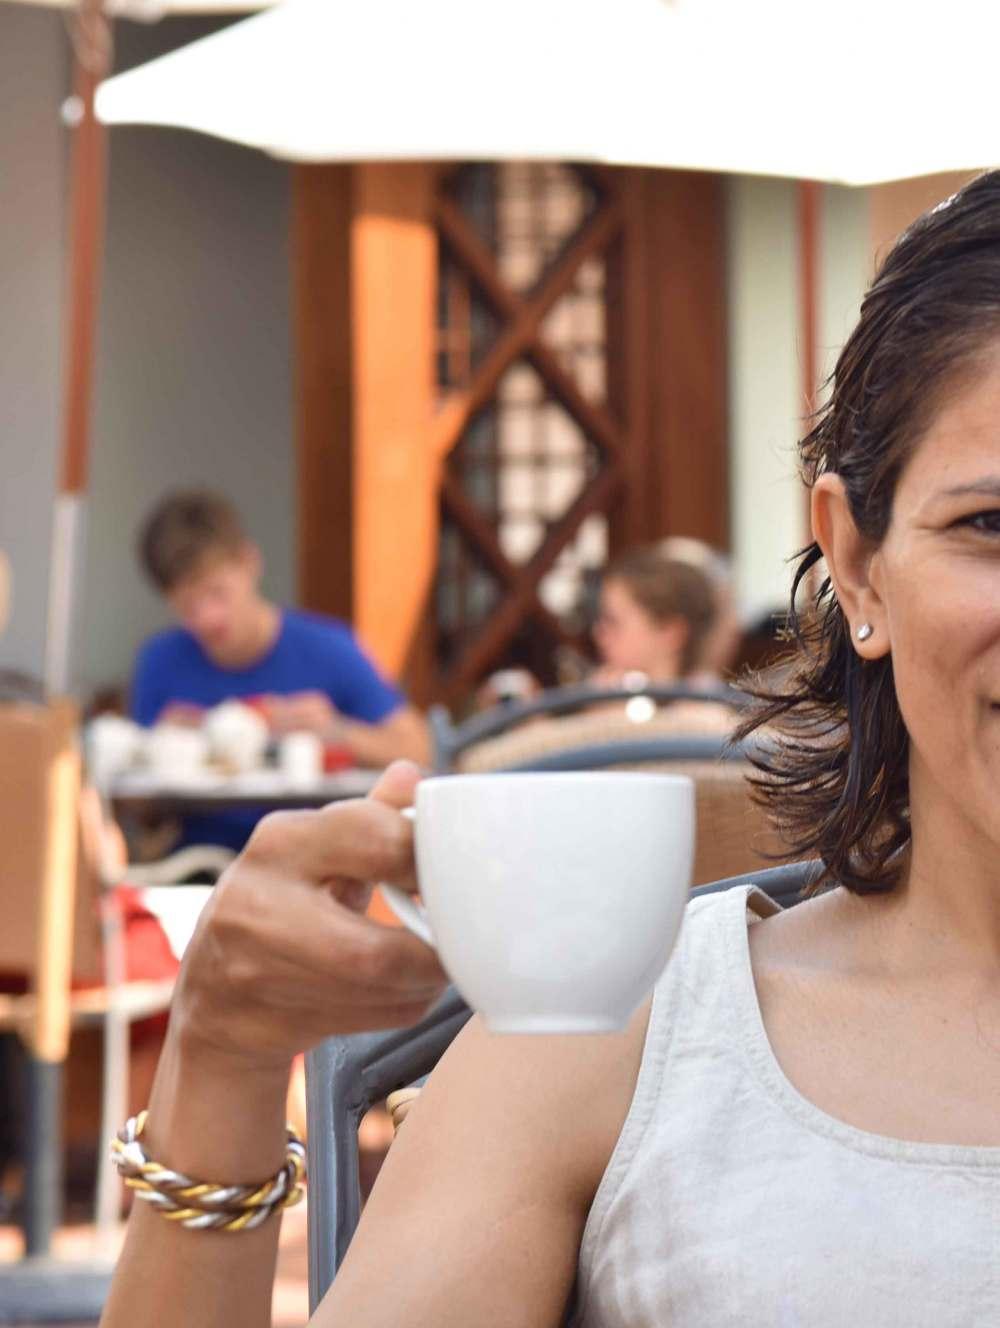 Cafe Americano for breakfast! Life's joyous moments. :) Park Hyatt Hotel, Goa, image©sourcingstyle.com.